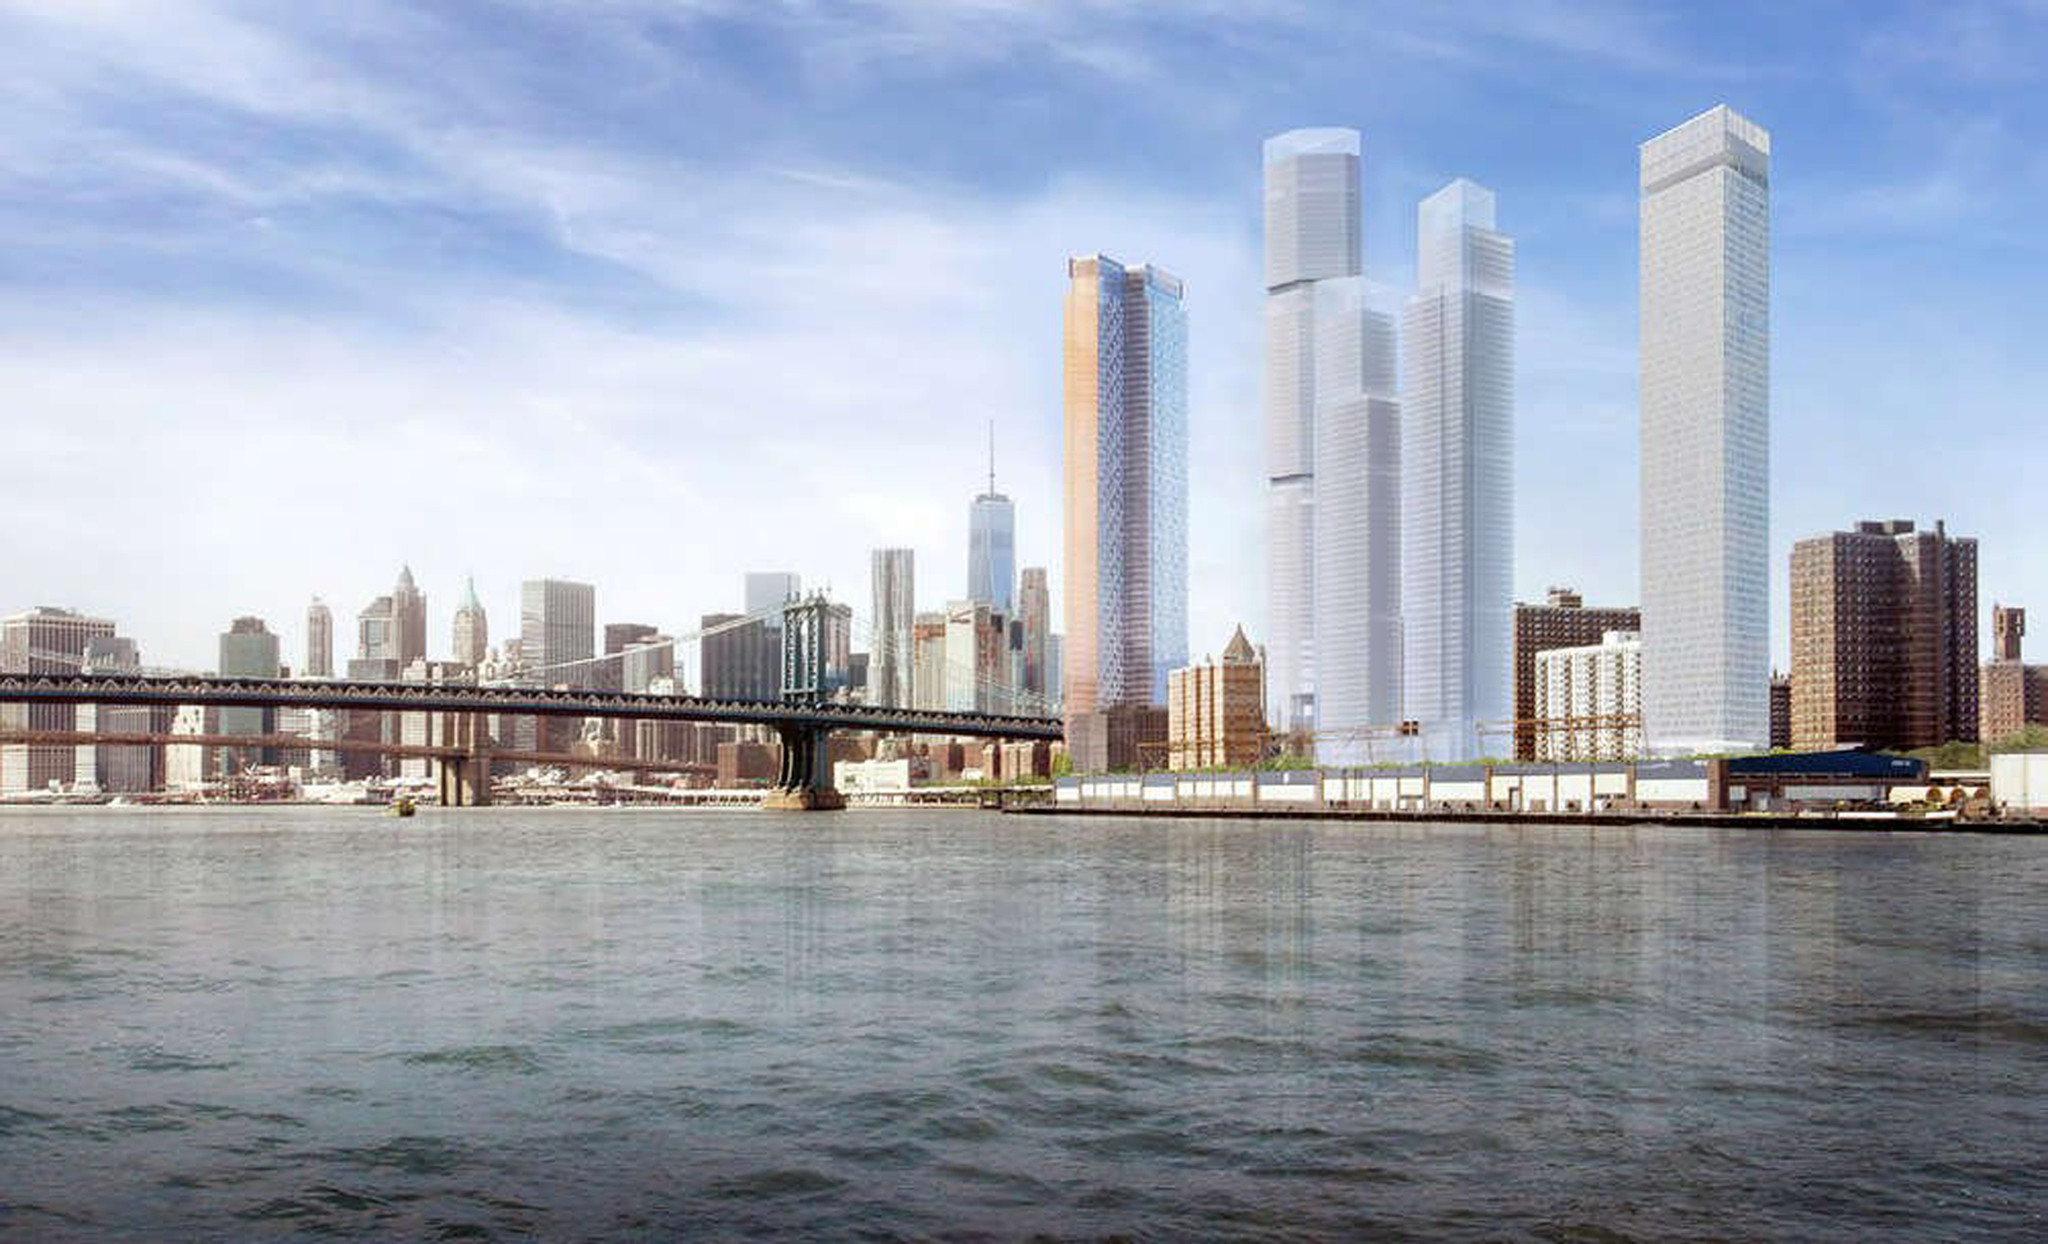 N.Y. judge rules against luxury 'Two Bridges' development that de Blasio had embraced